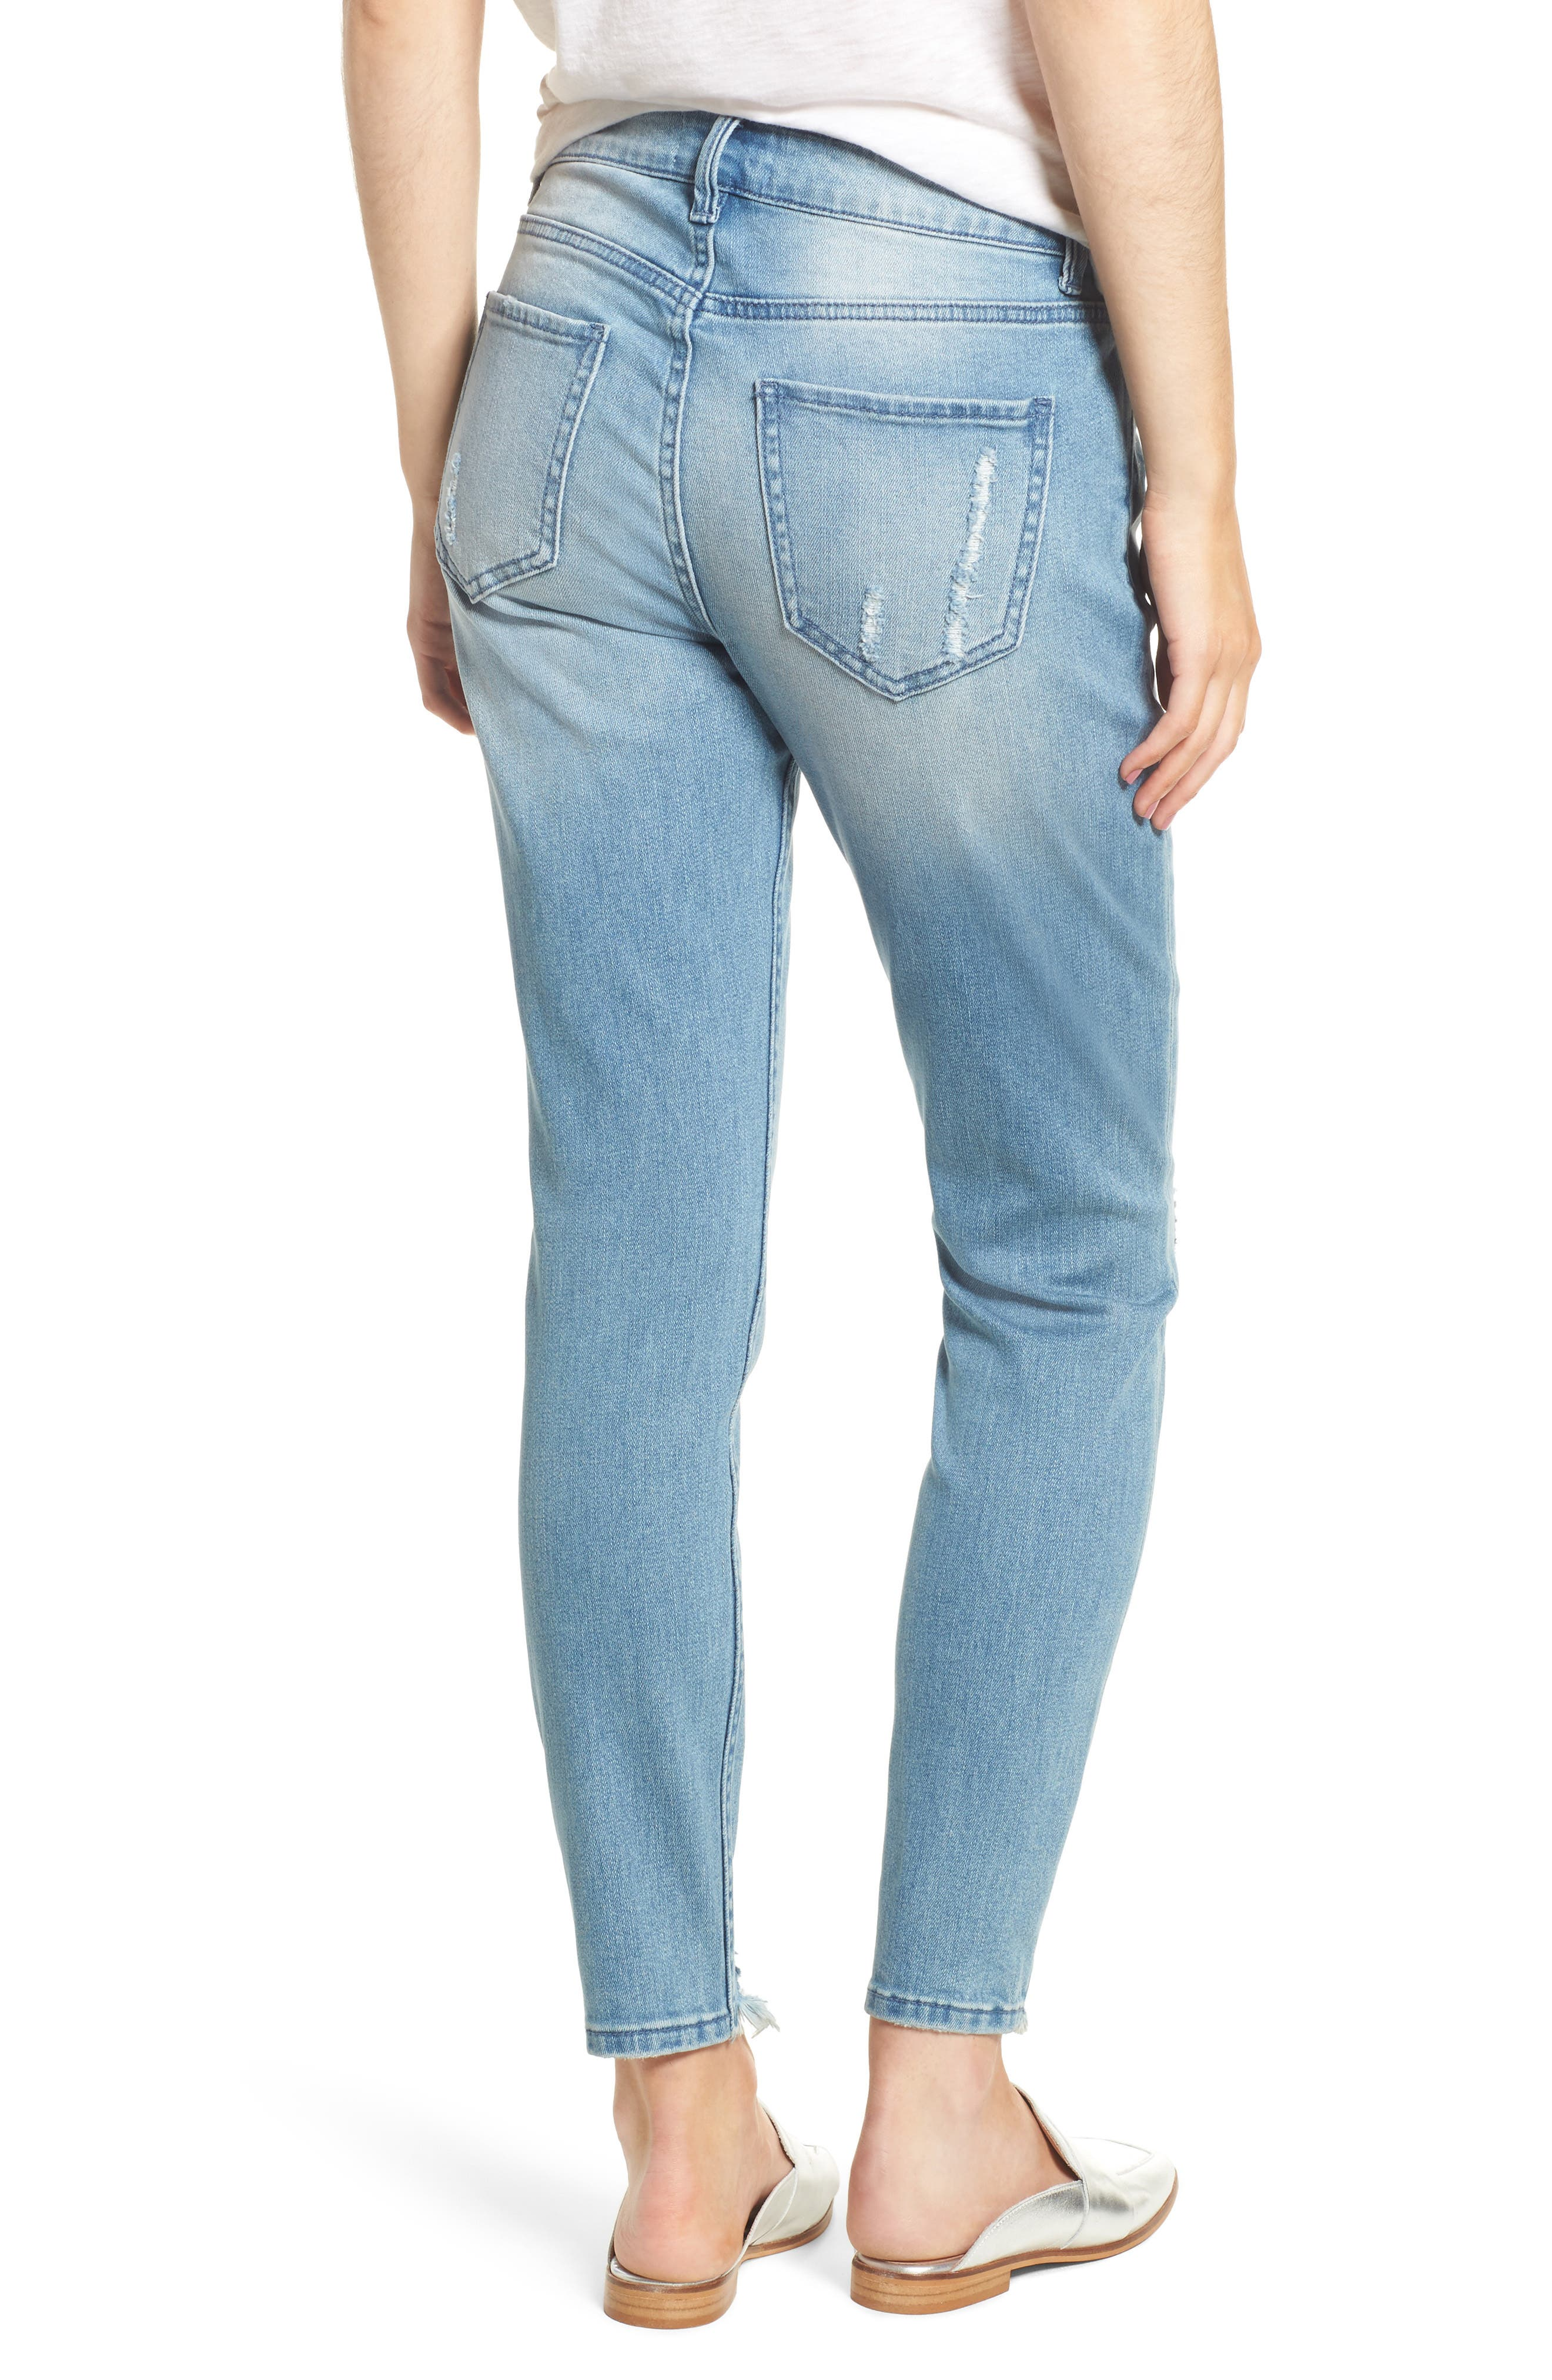 Verona Skinny Jeans,                             Alternate thumbnail 2, color,                             403